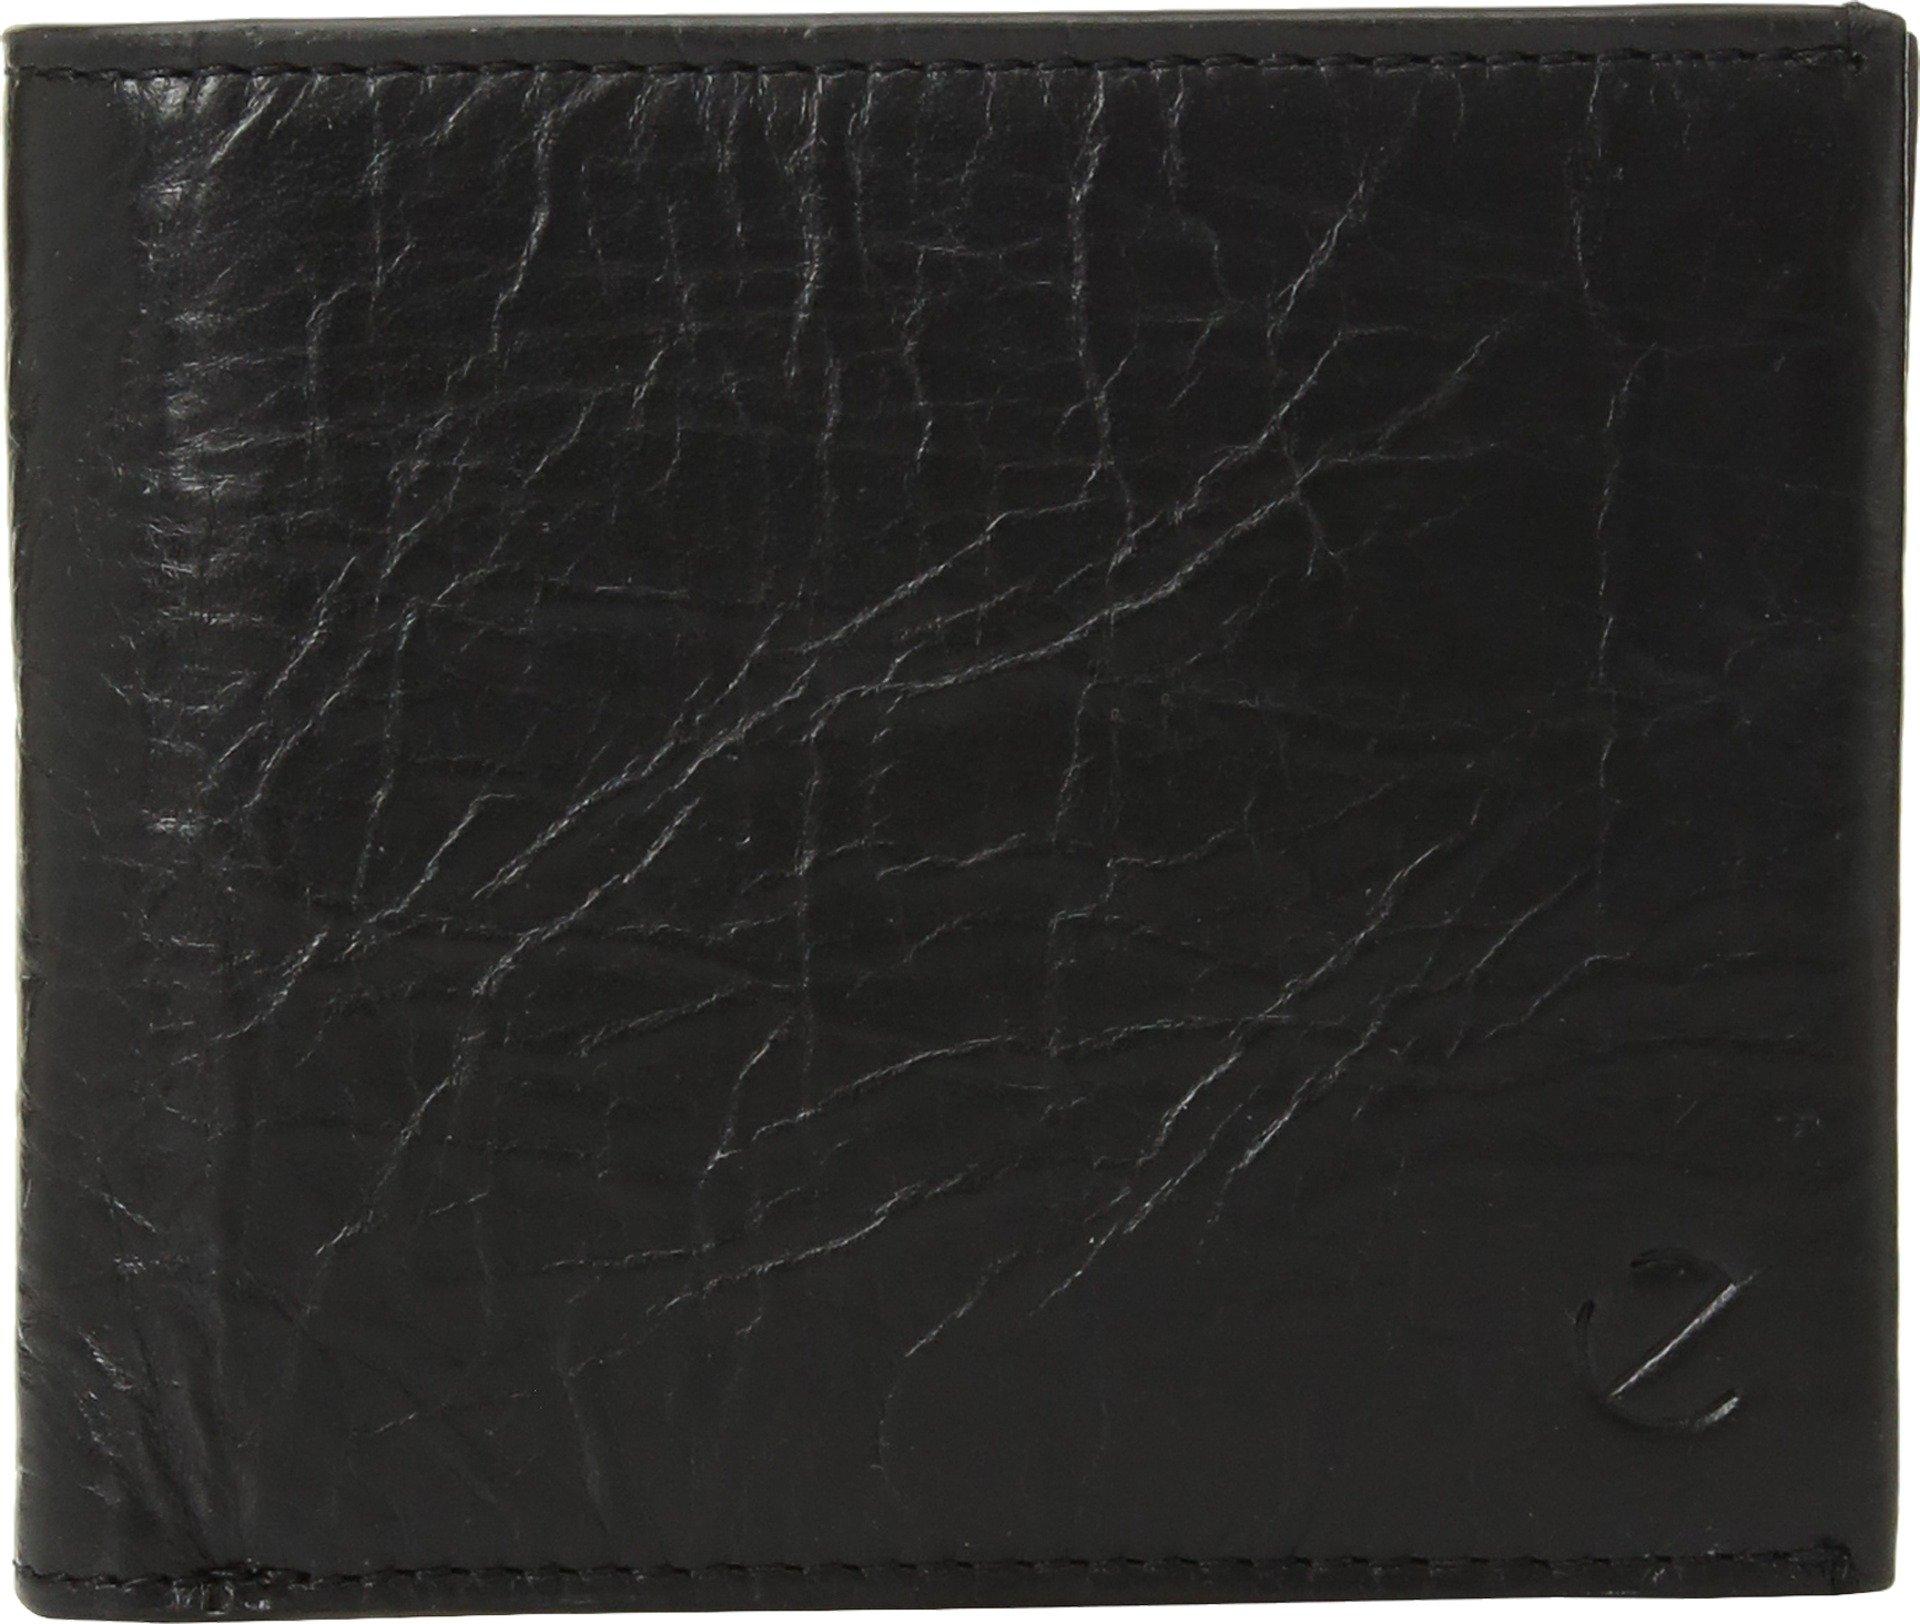 ECCO Arne Rfid Billfold Wallet, Black